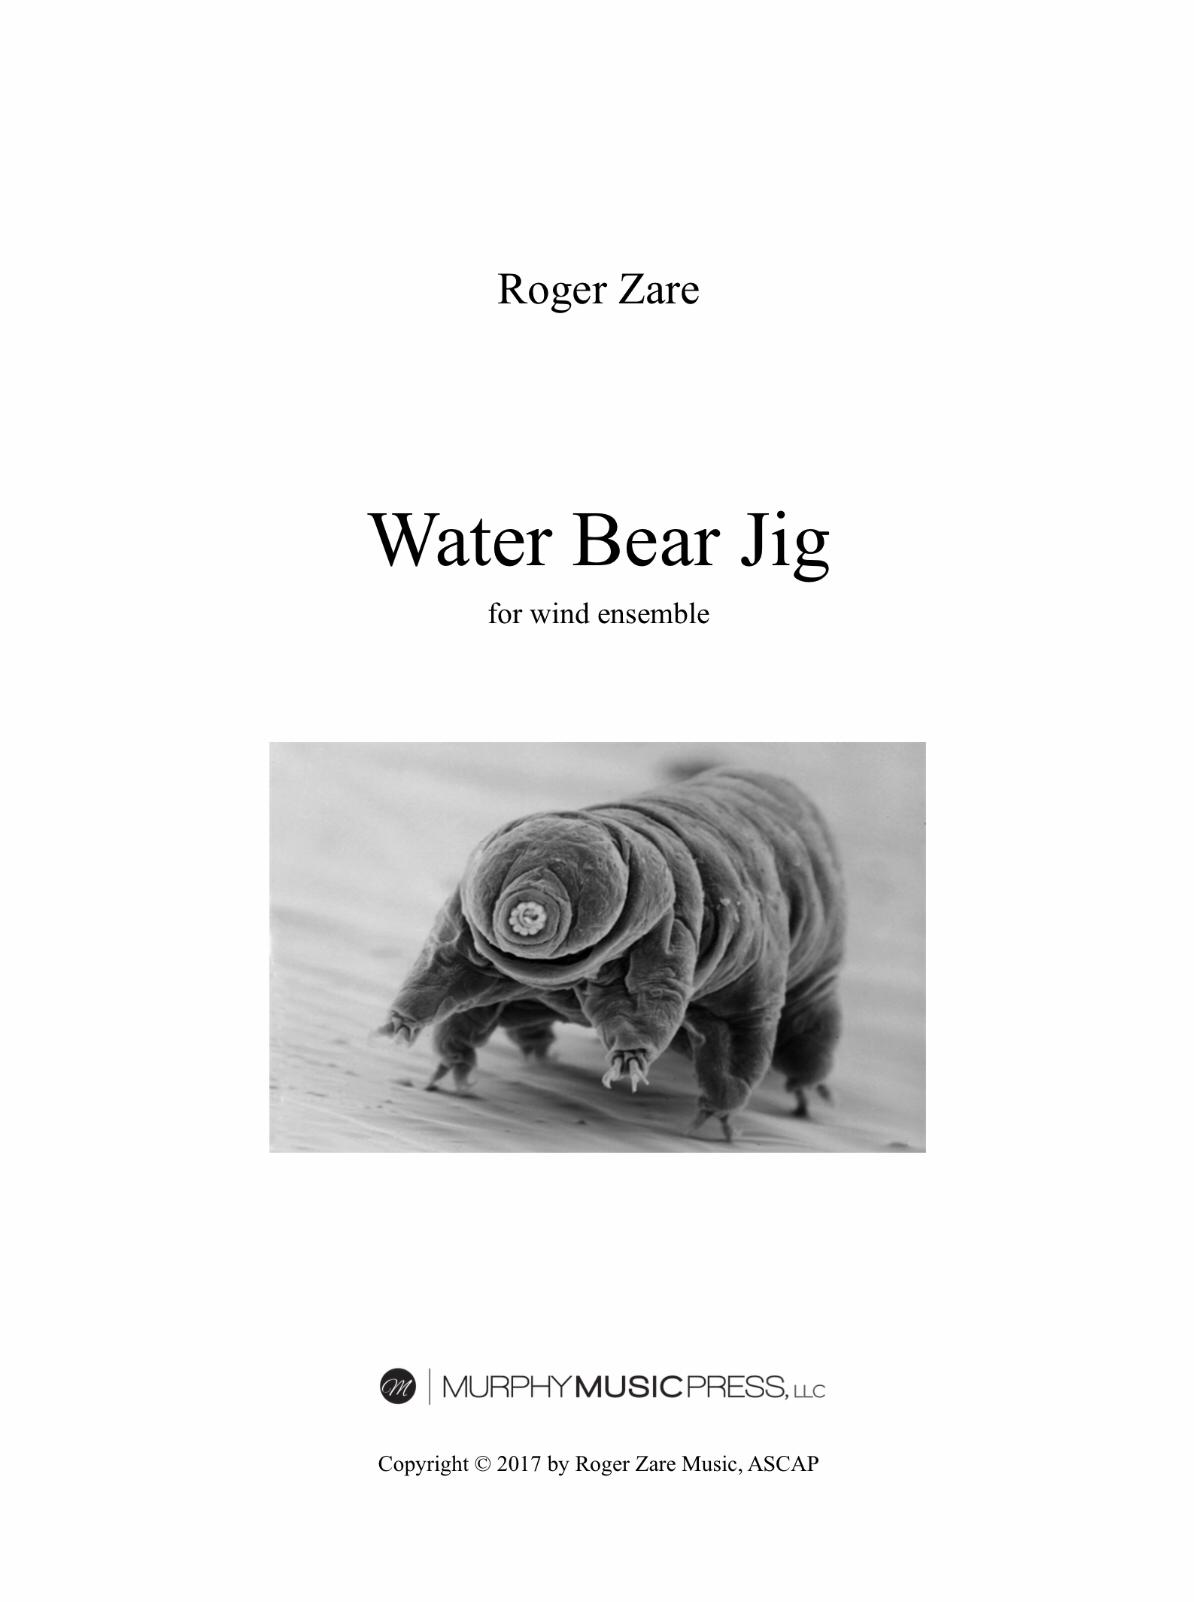 Water Bear Jig (Score Only) by Roger Zare